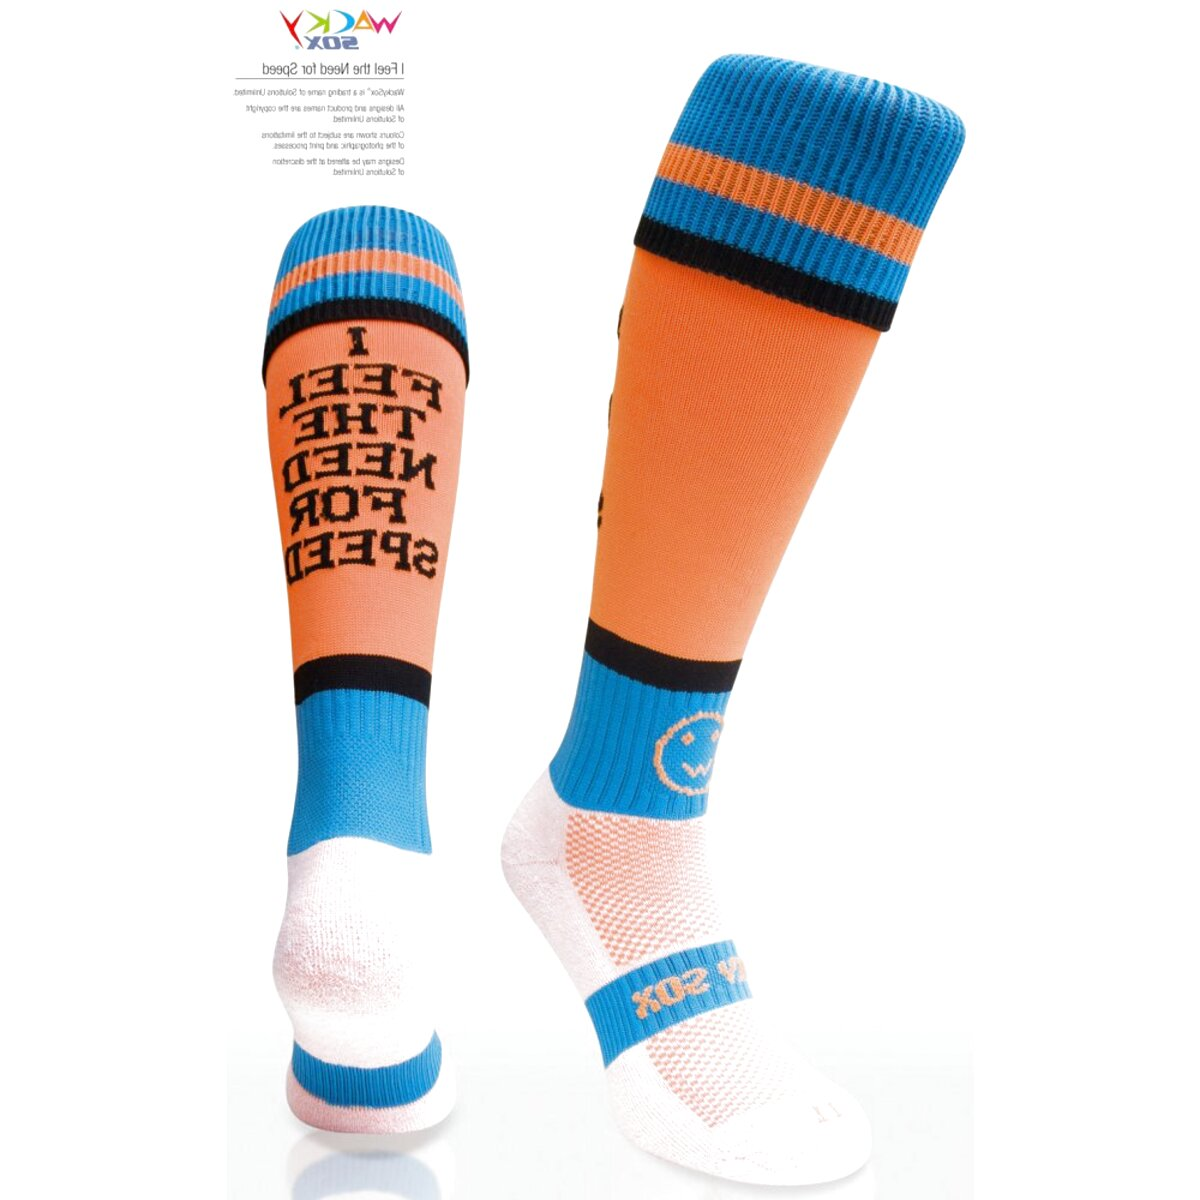 wacky rugby socks for sale